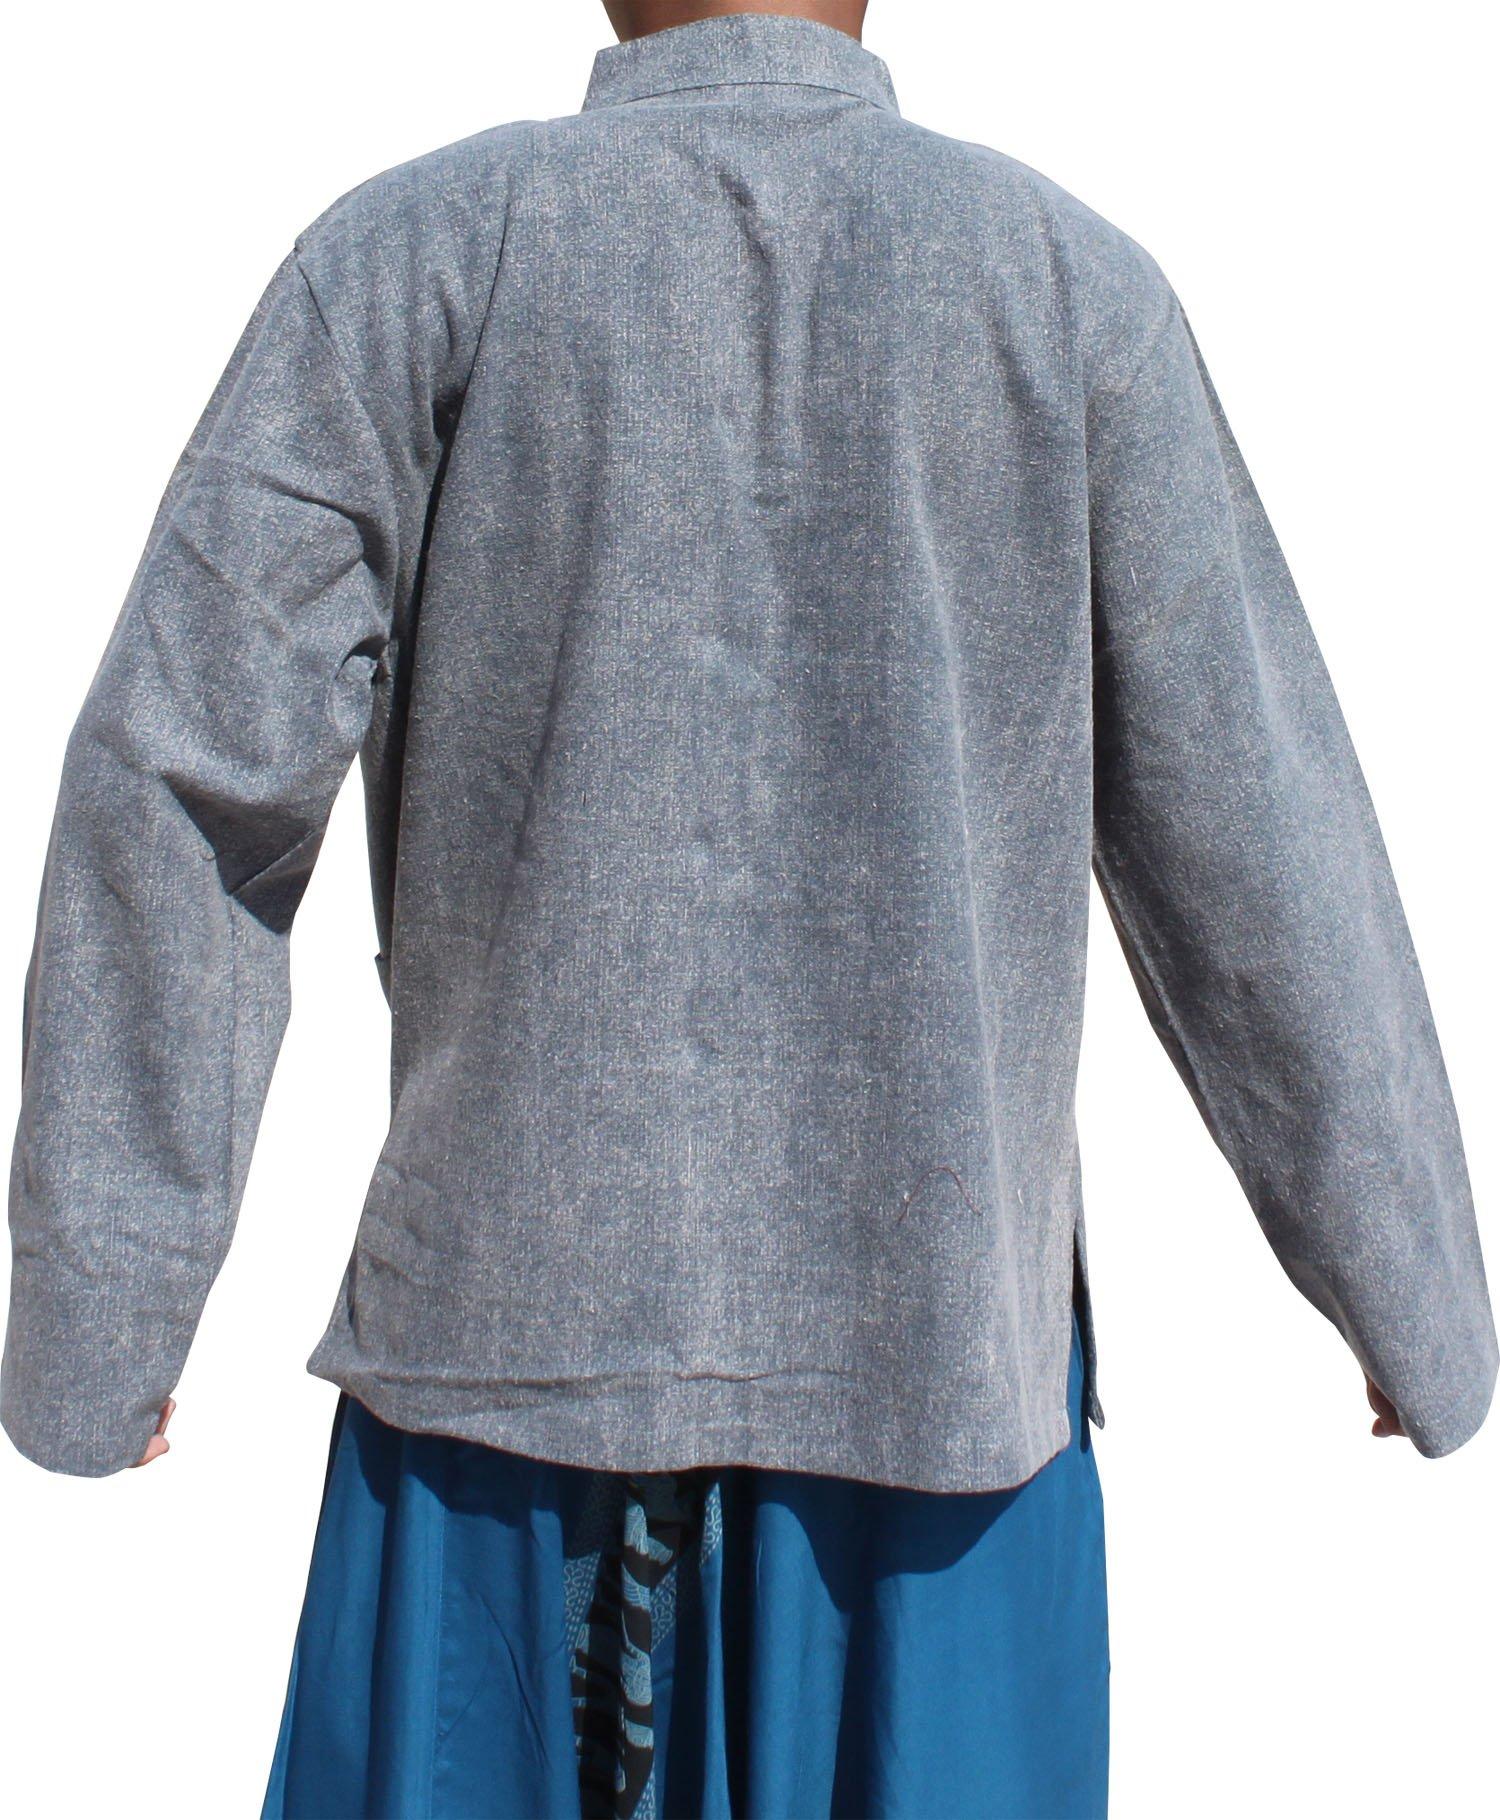 Raan Pah Muang Stonewash Medieval Cotton Shirt Chinese Jacket Collar Long Sleeve Plus, XX-Large, Gray by Raan Pah Muang (Image #2)